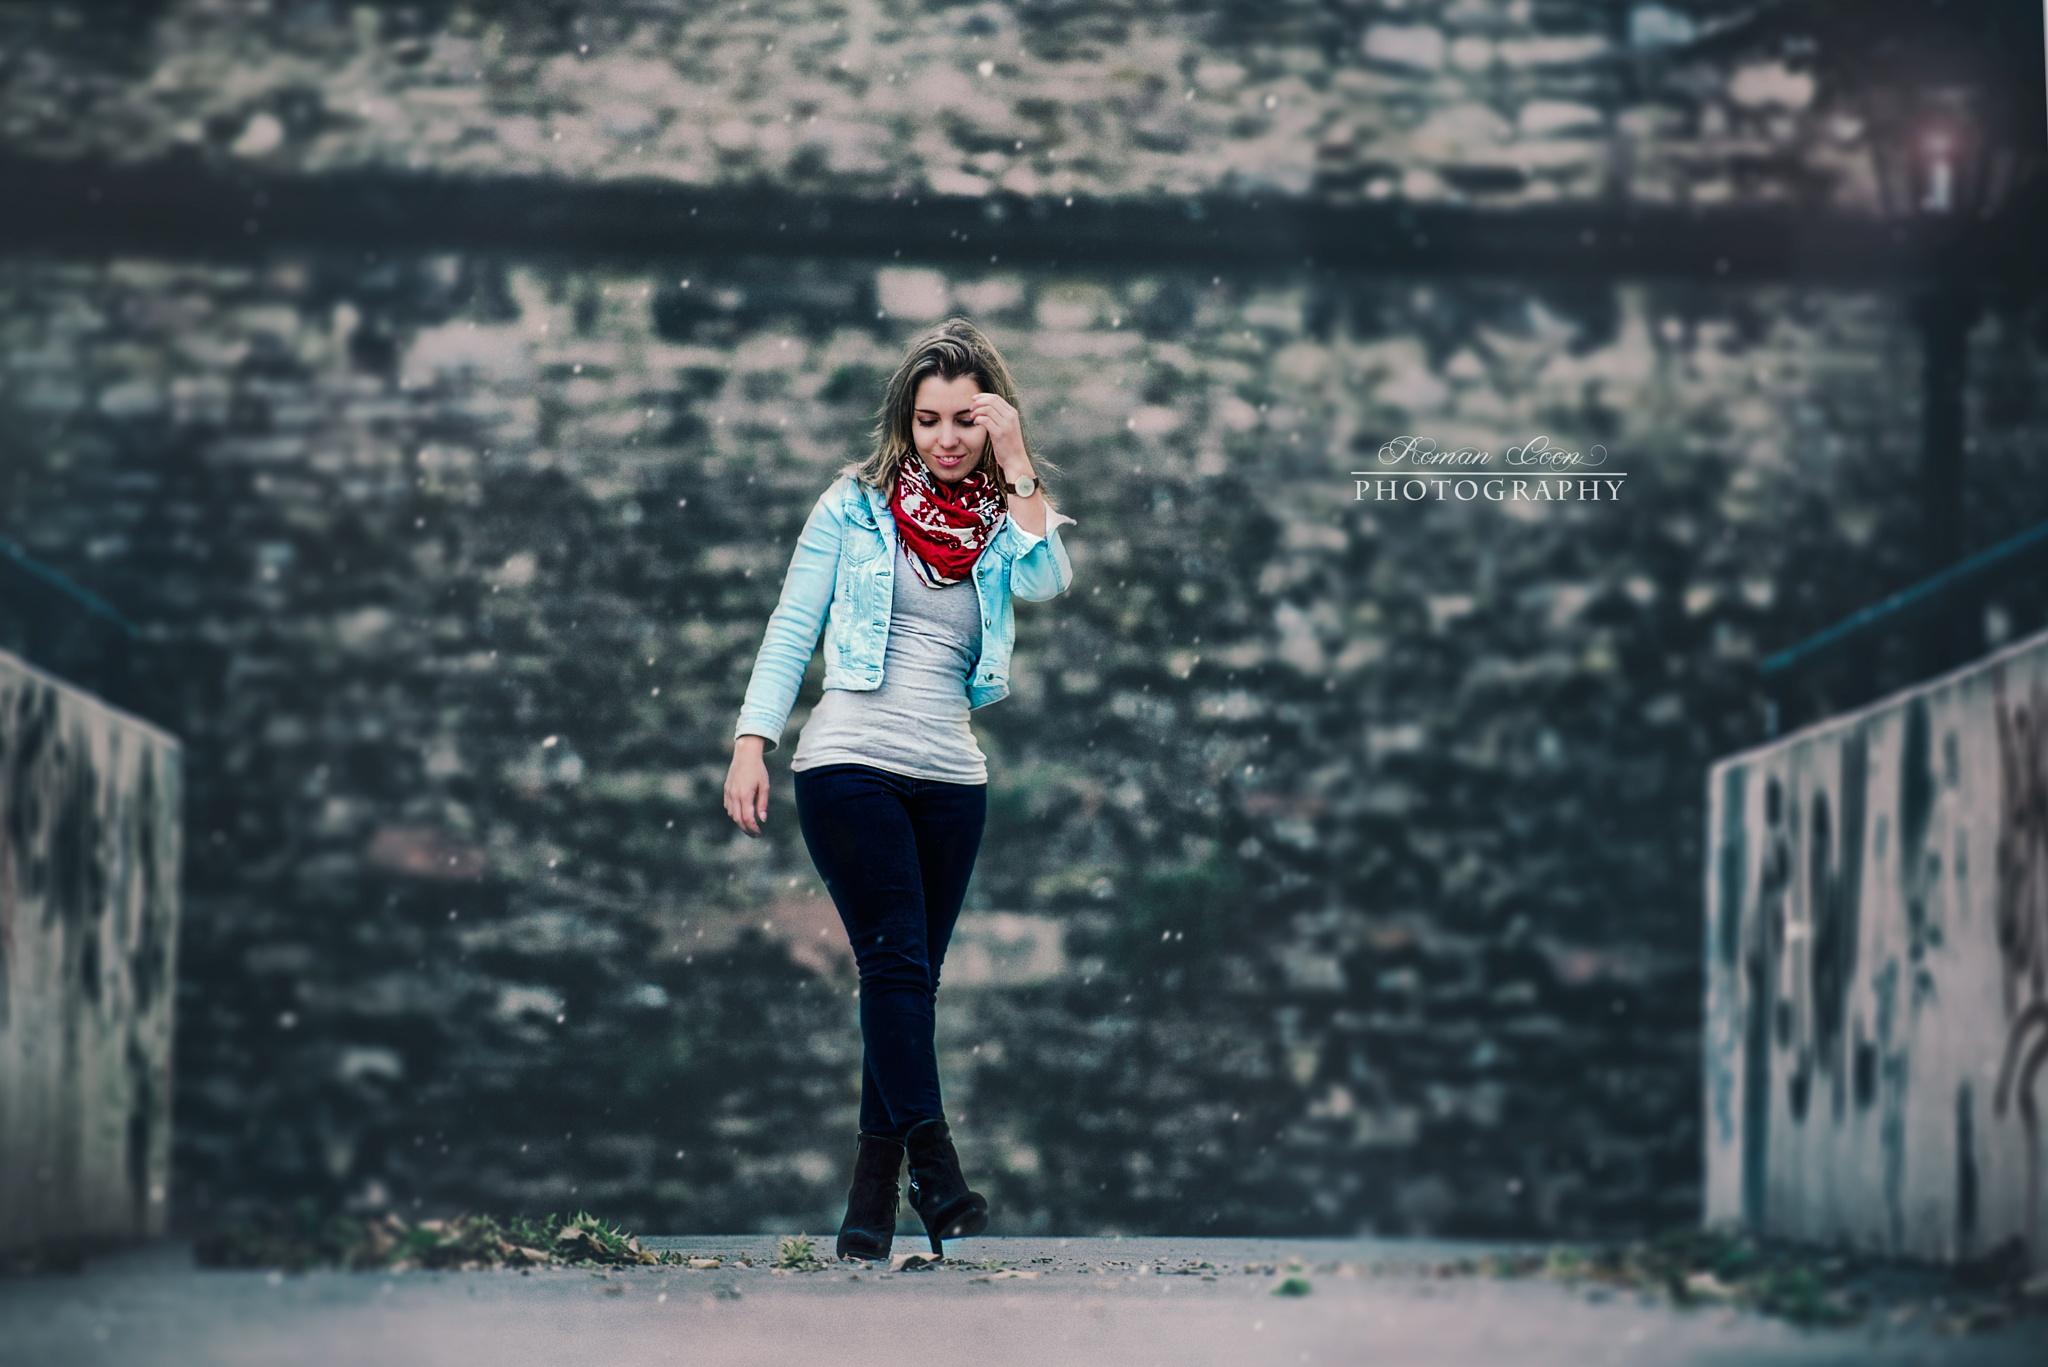 """unsure"" by RomanCoonPhotography"